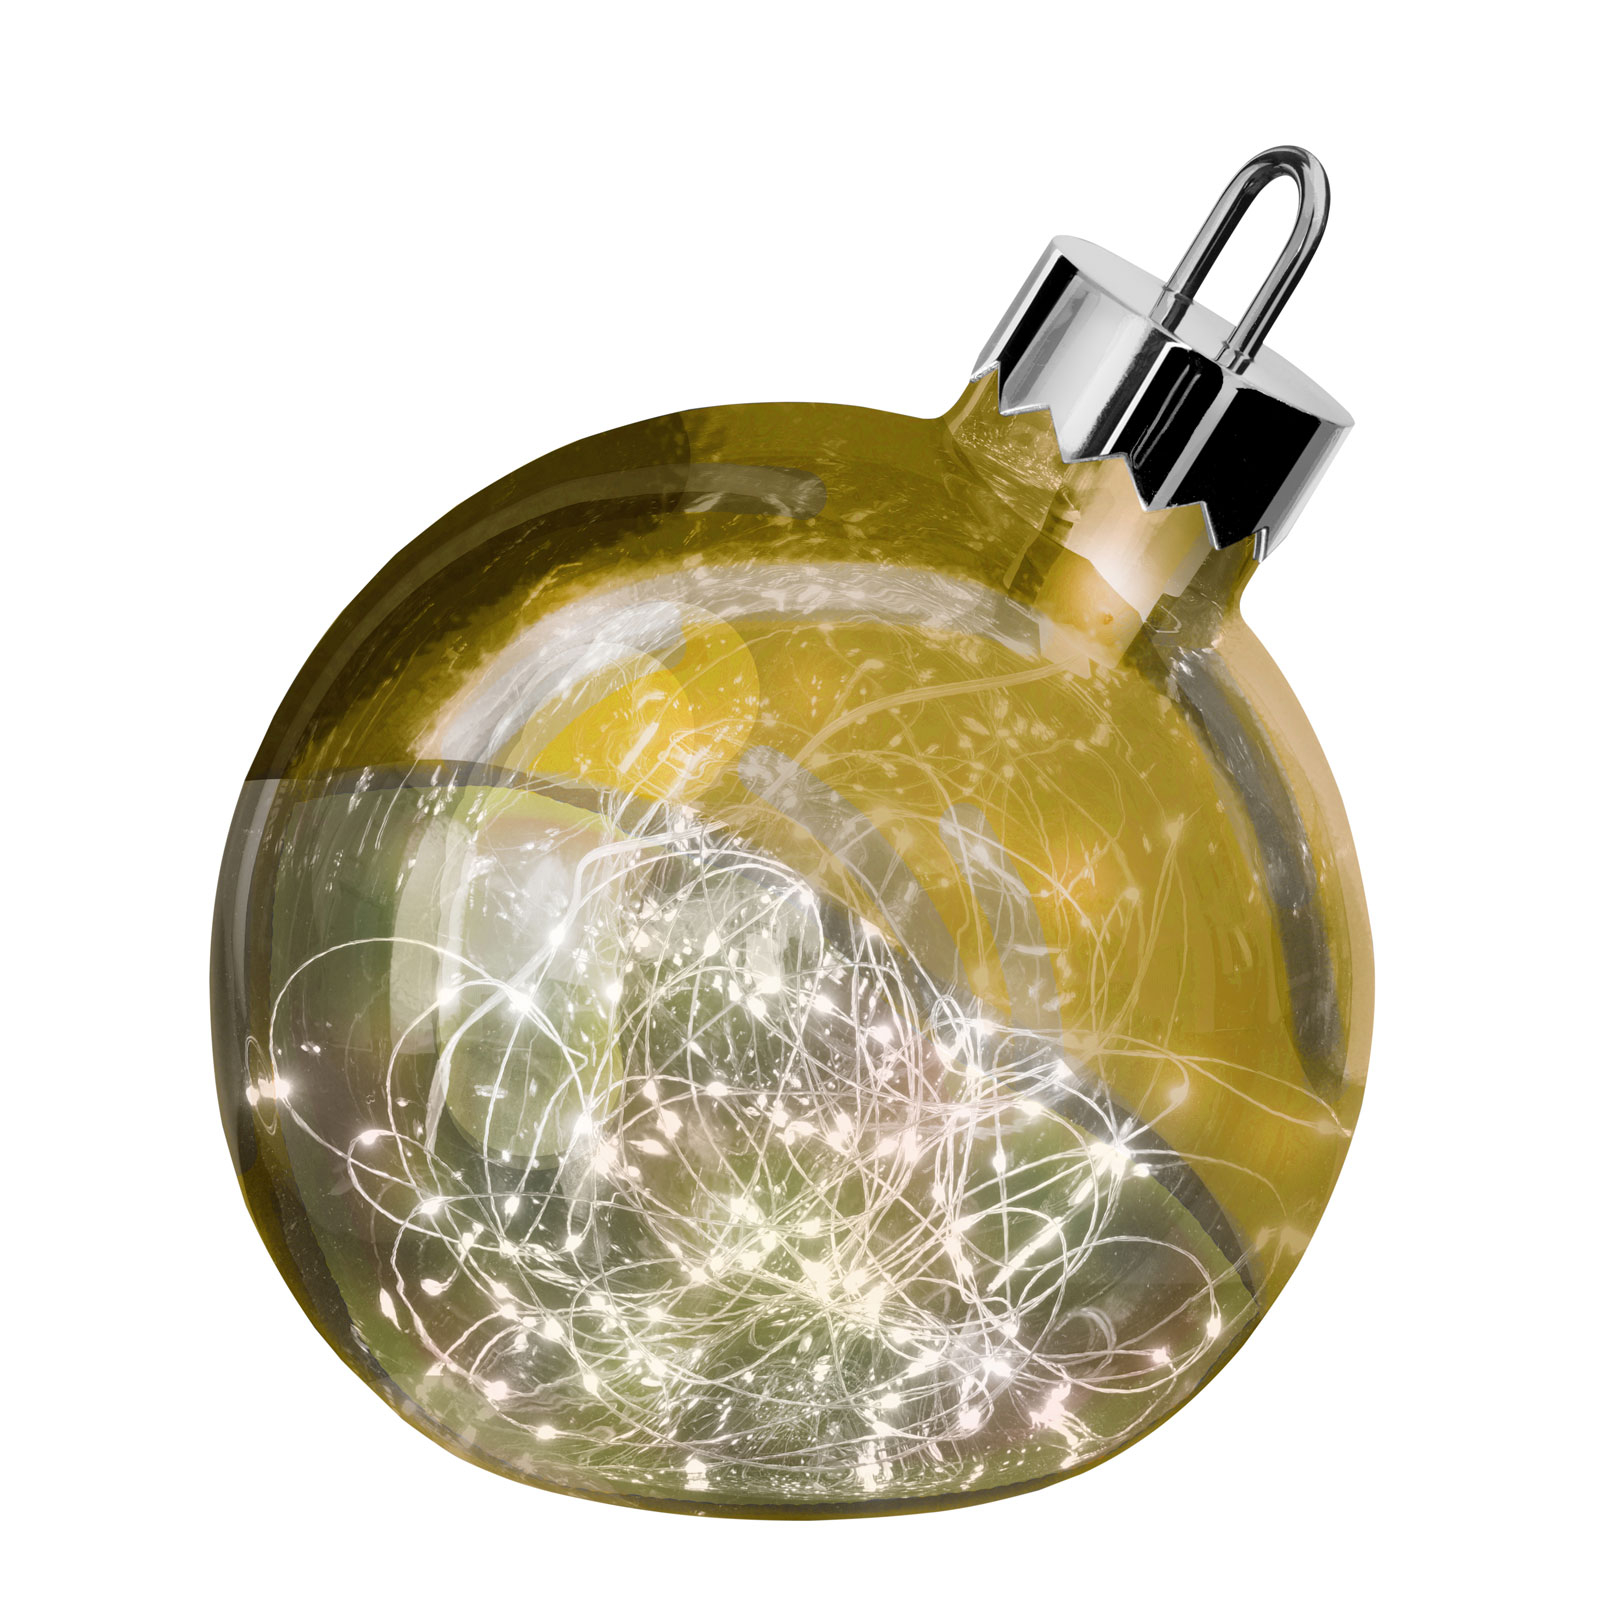 Ornament decorative light, gold, 30 cm diameter